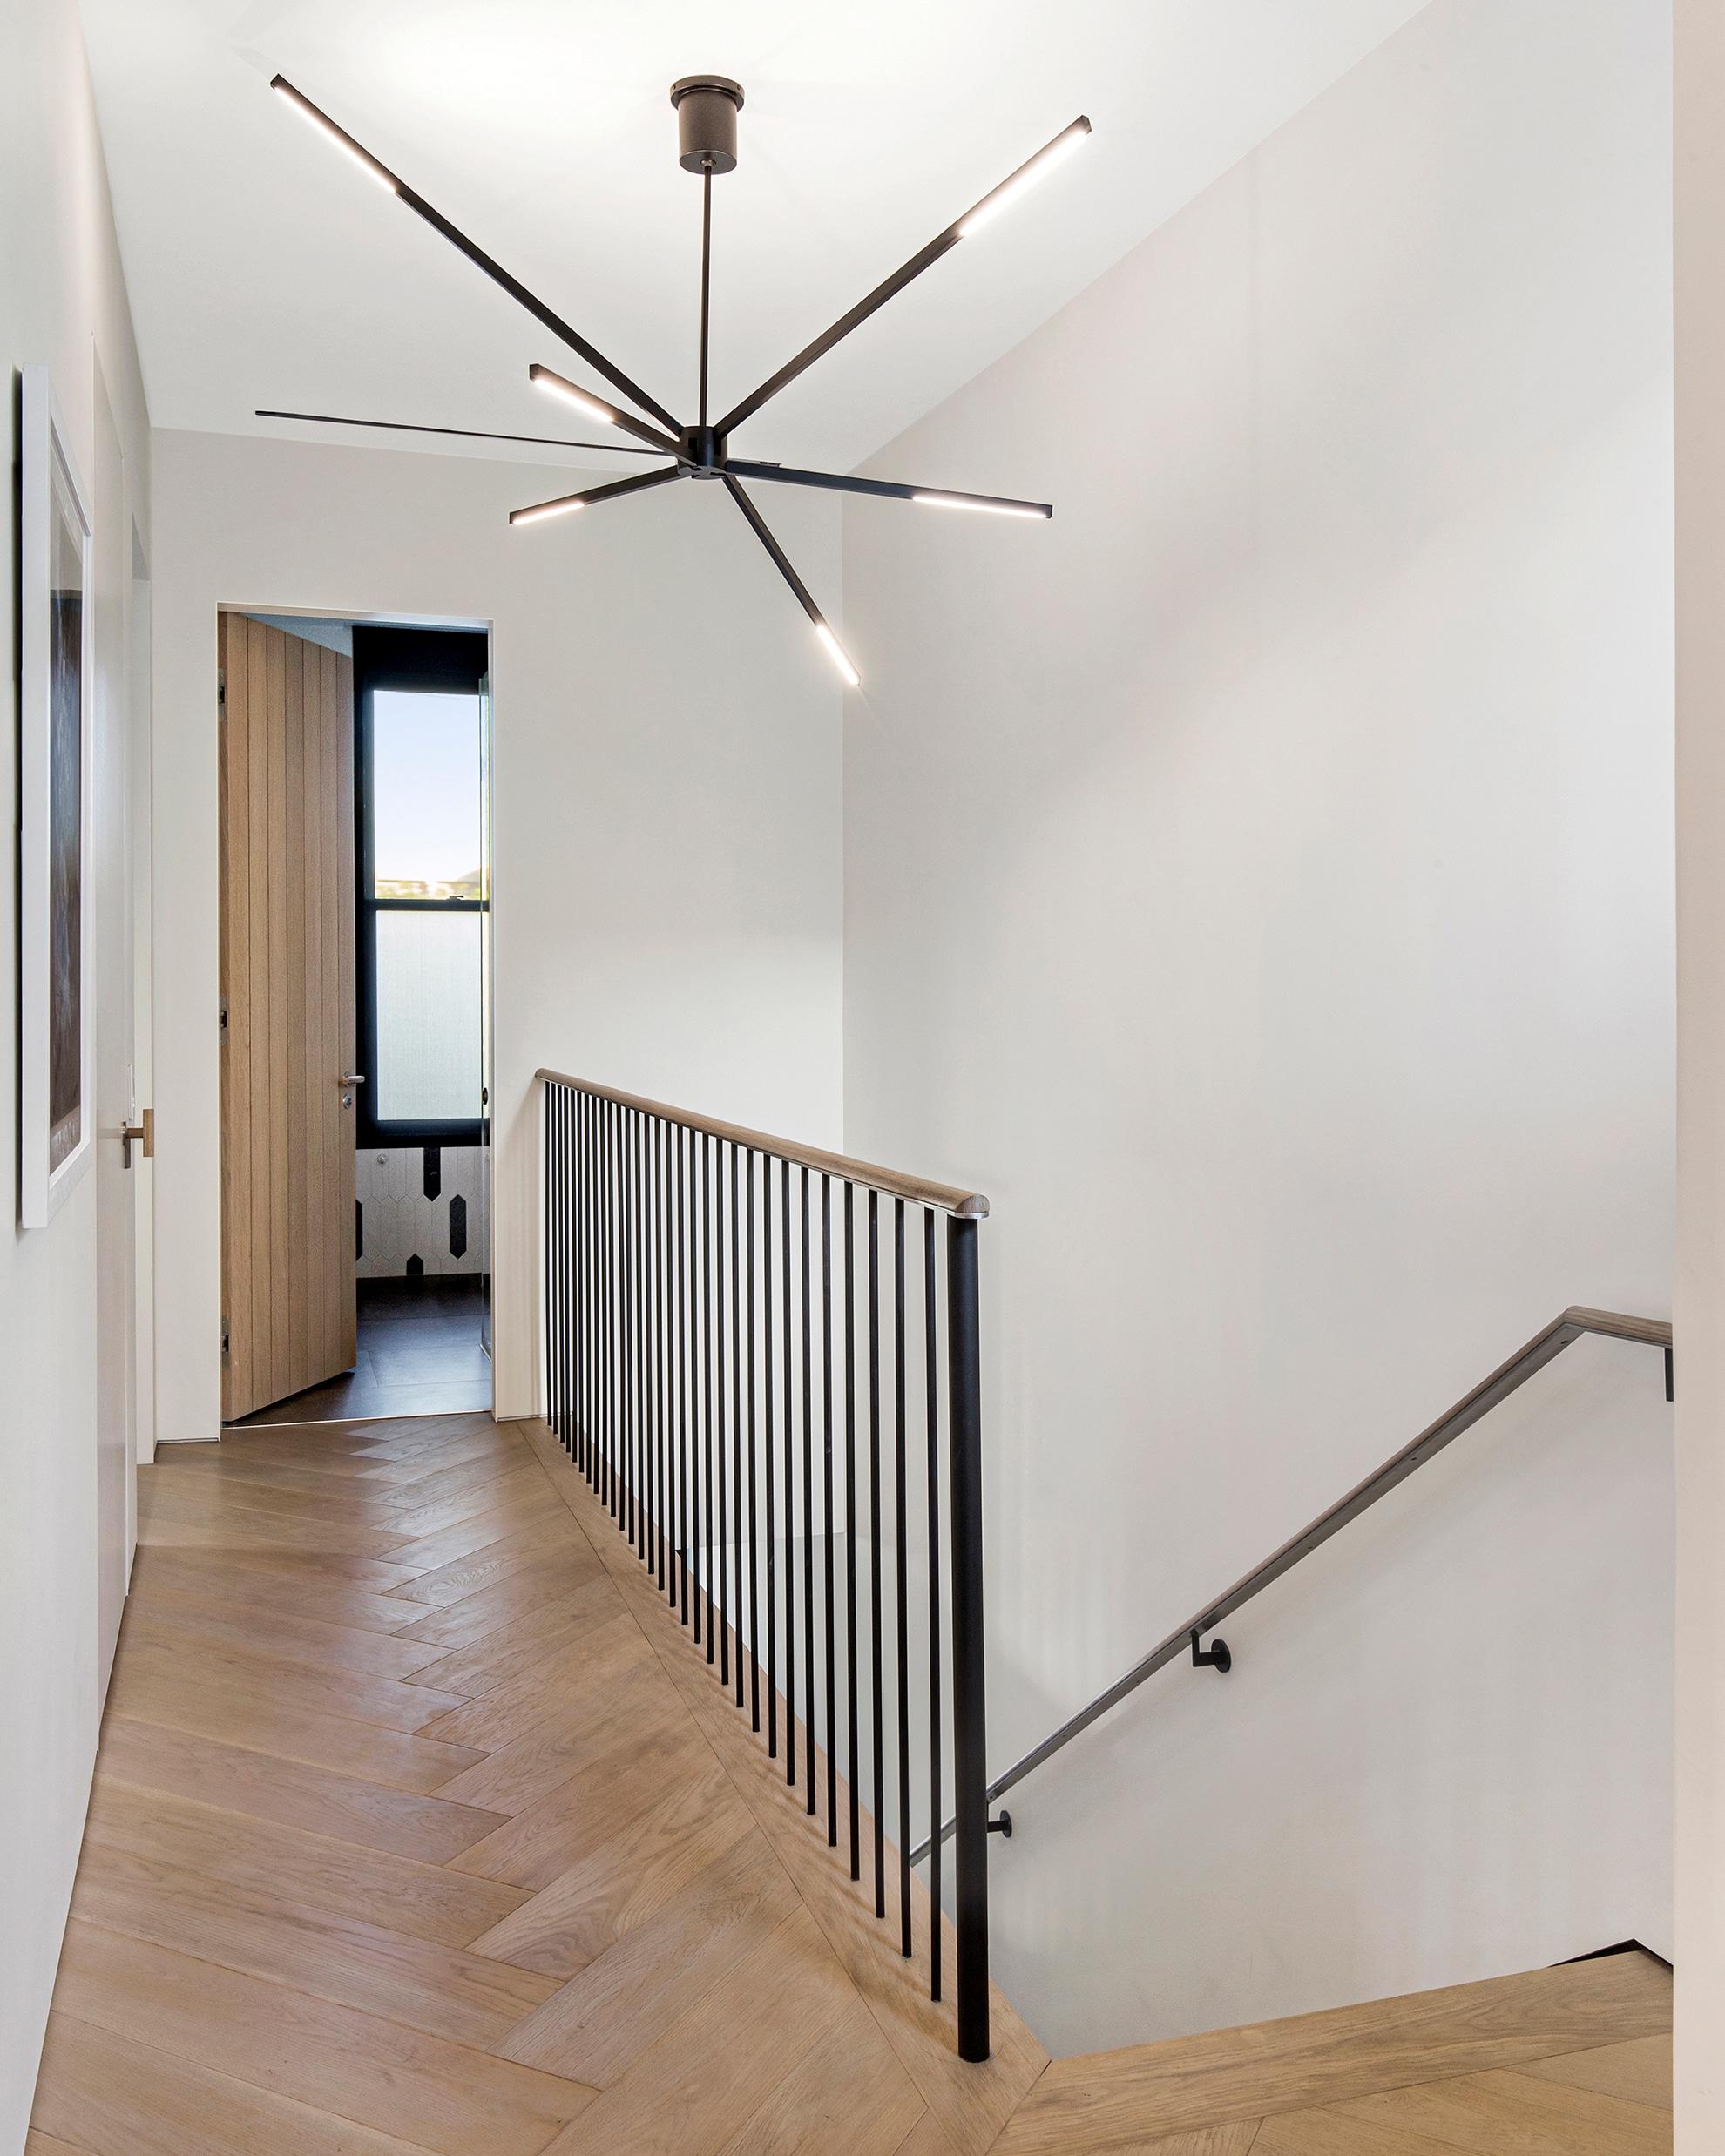 portfolio, castro district residential remodel, interior hallway upstairs